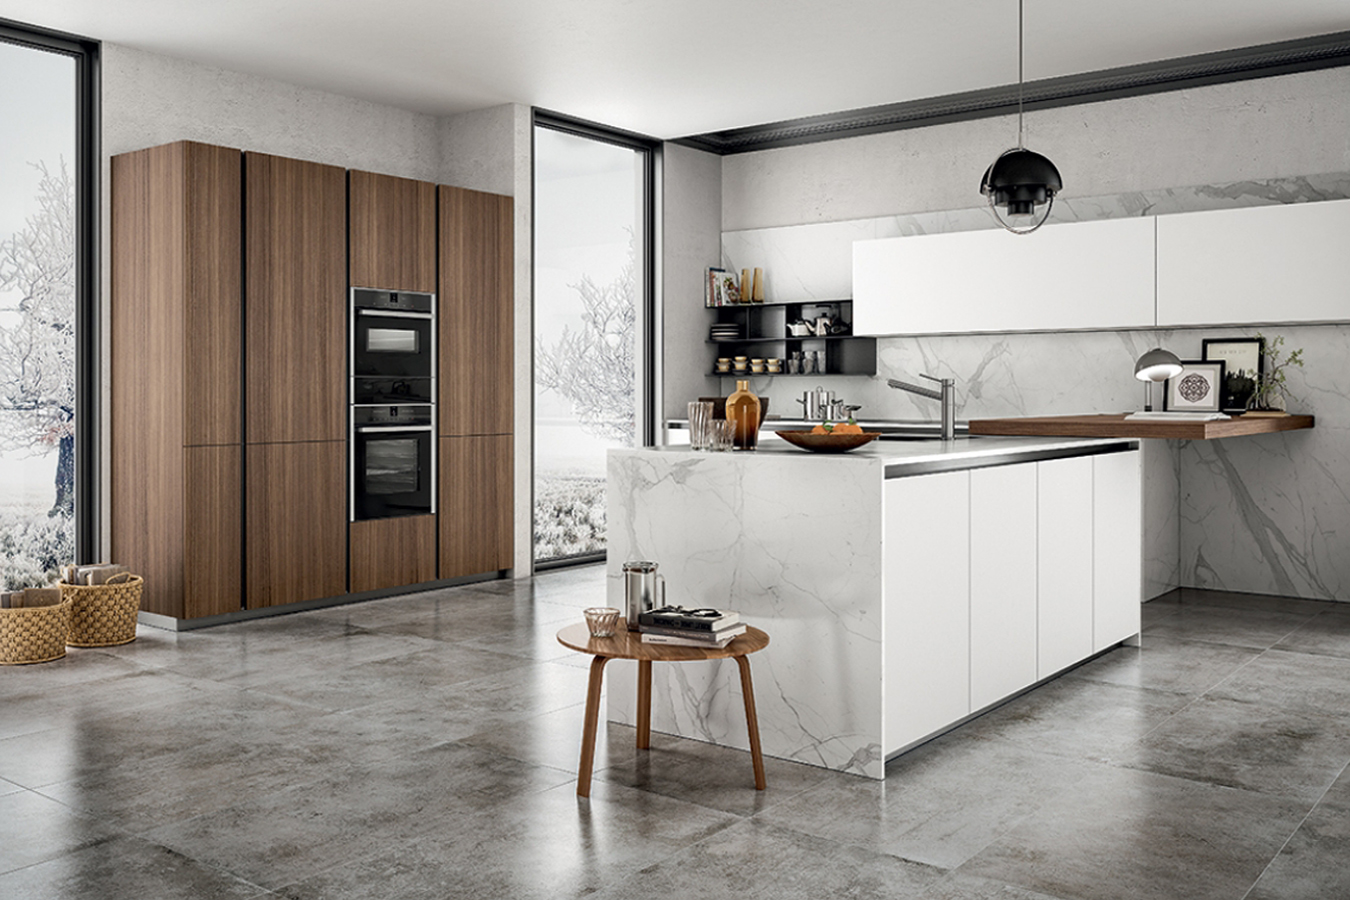 Cucina zetasei di arredo3 righetti mobili novara - Cucine arredo 3 ...